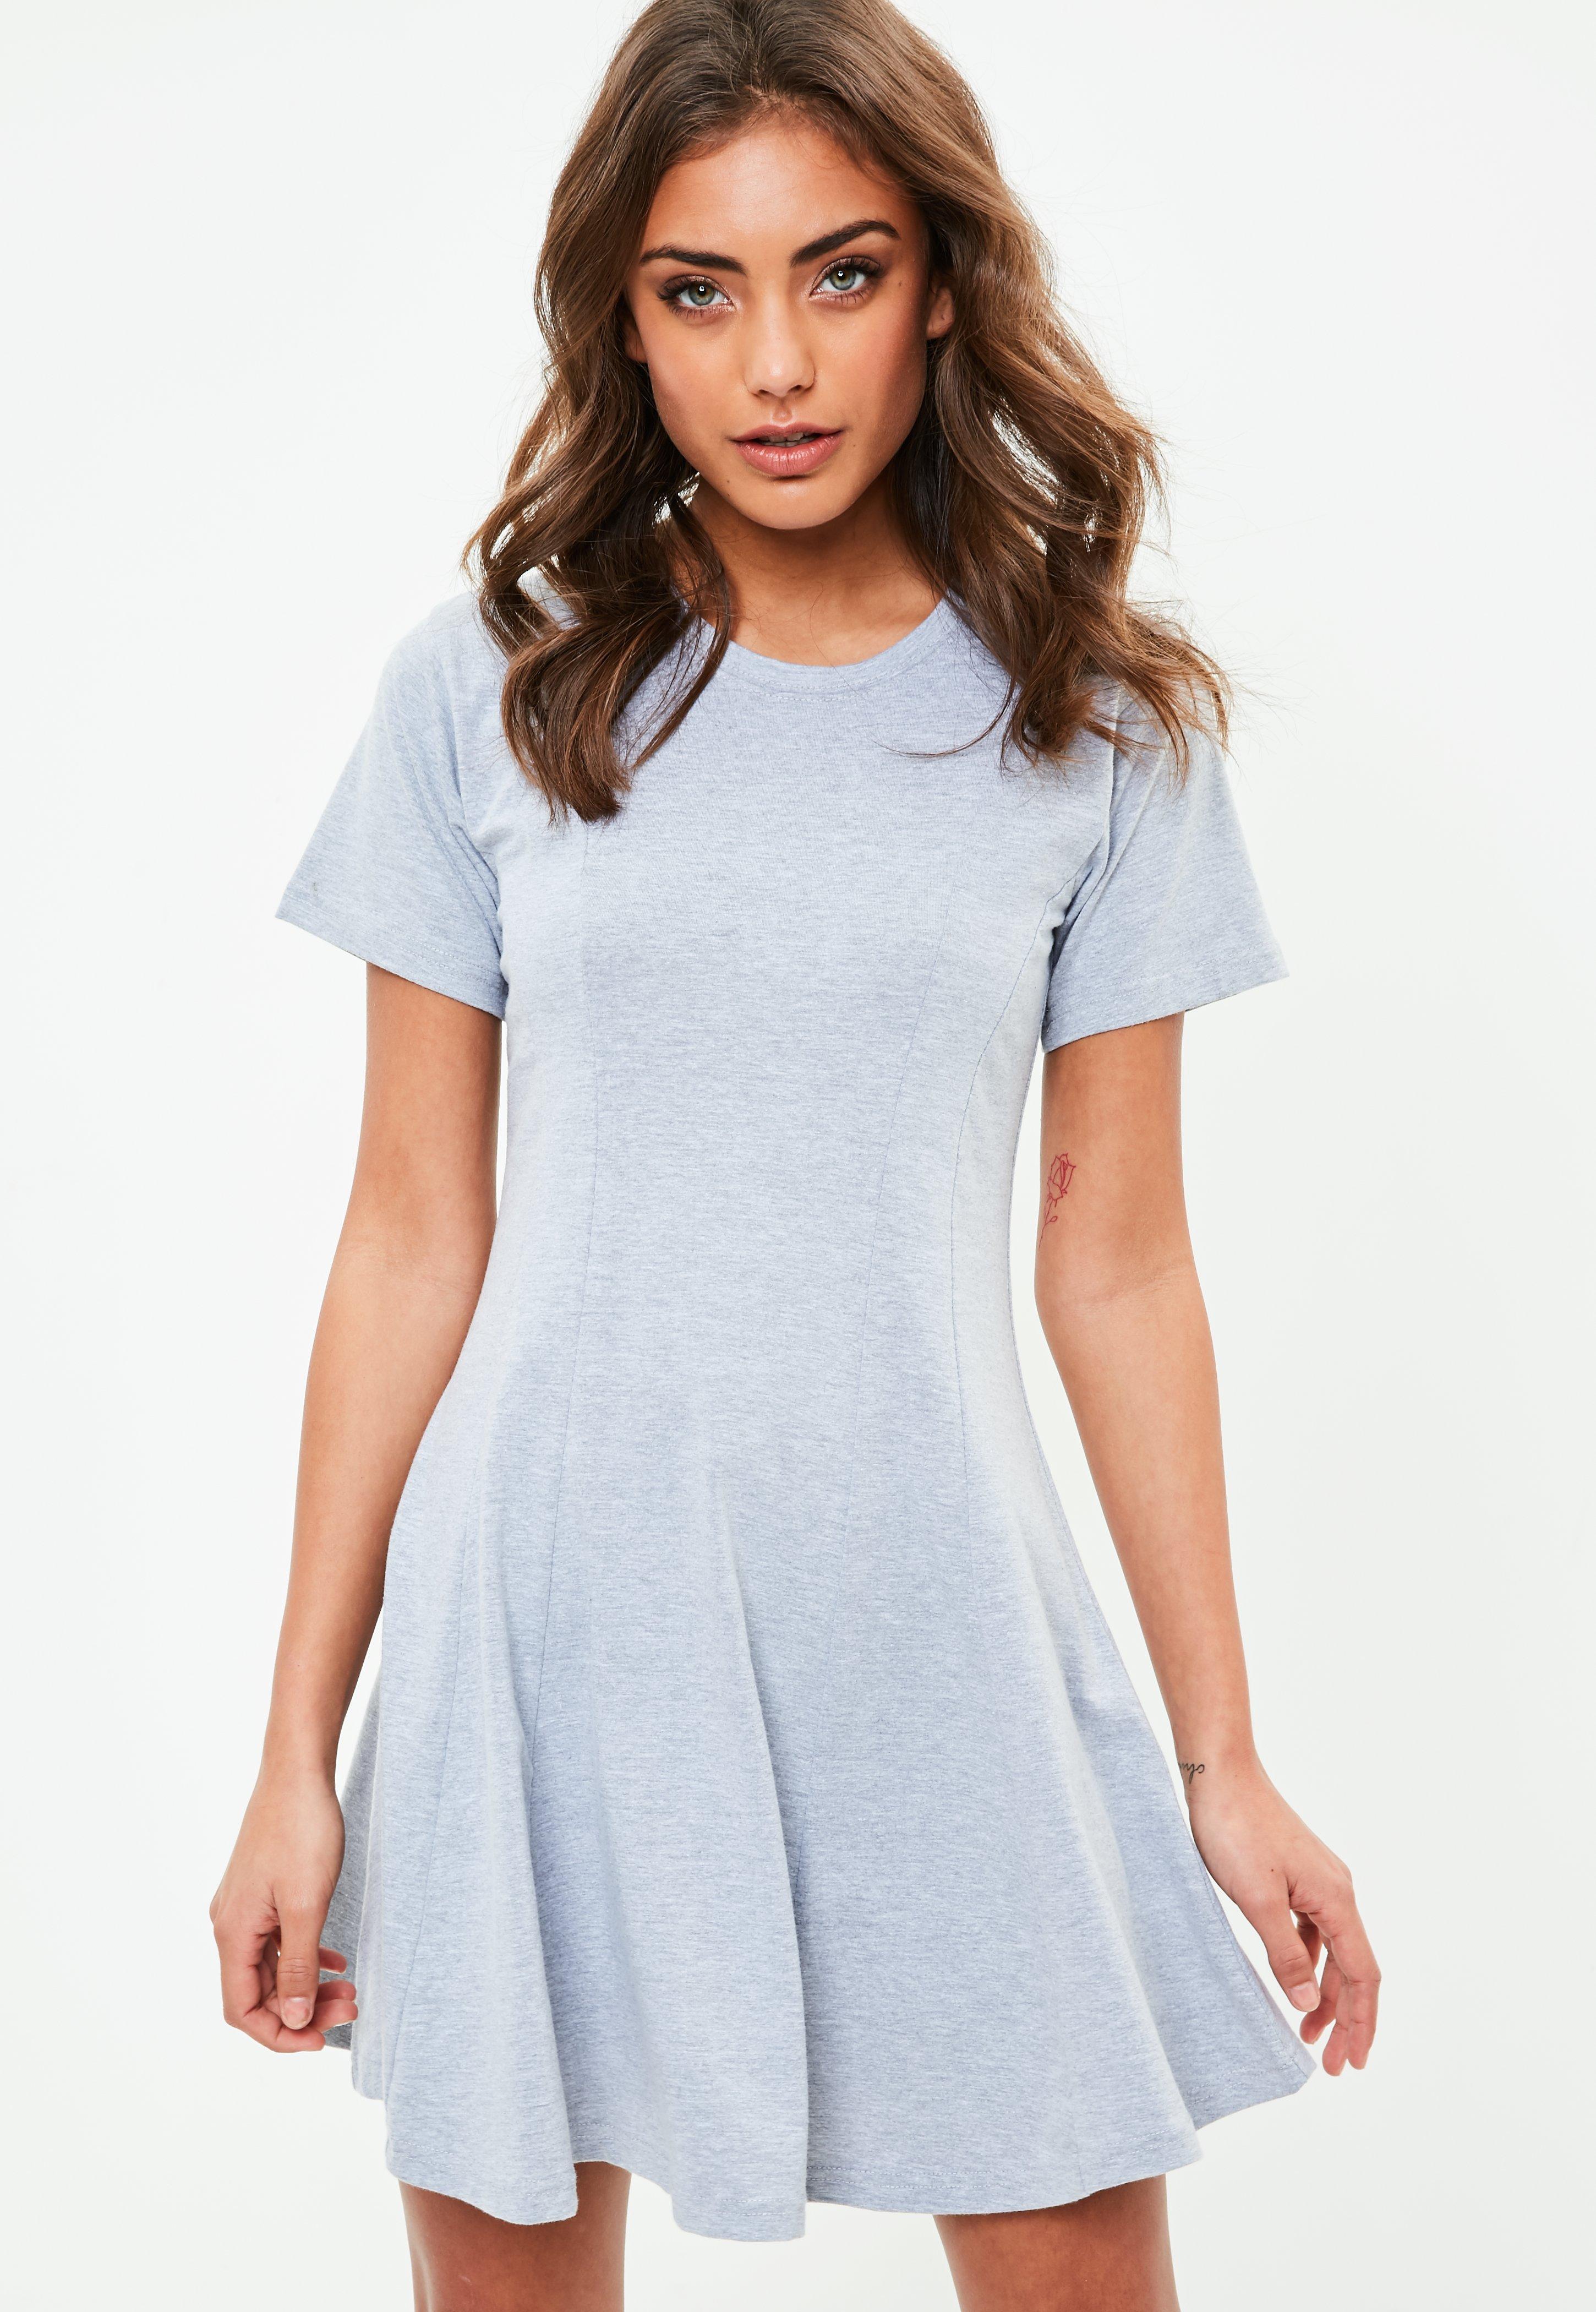 9110f88bd6d2 grey-jersey-skater-dress